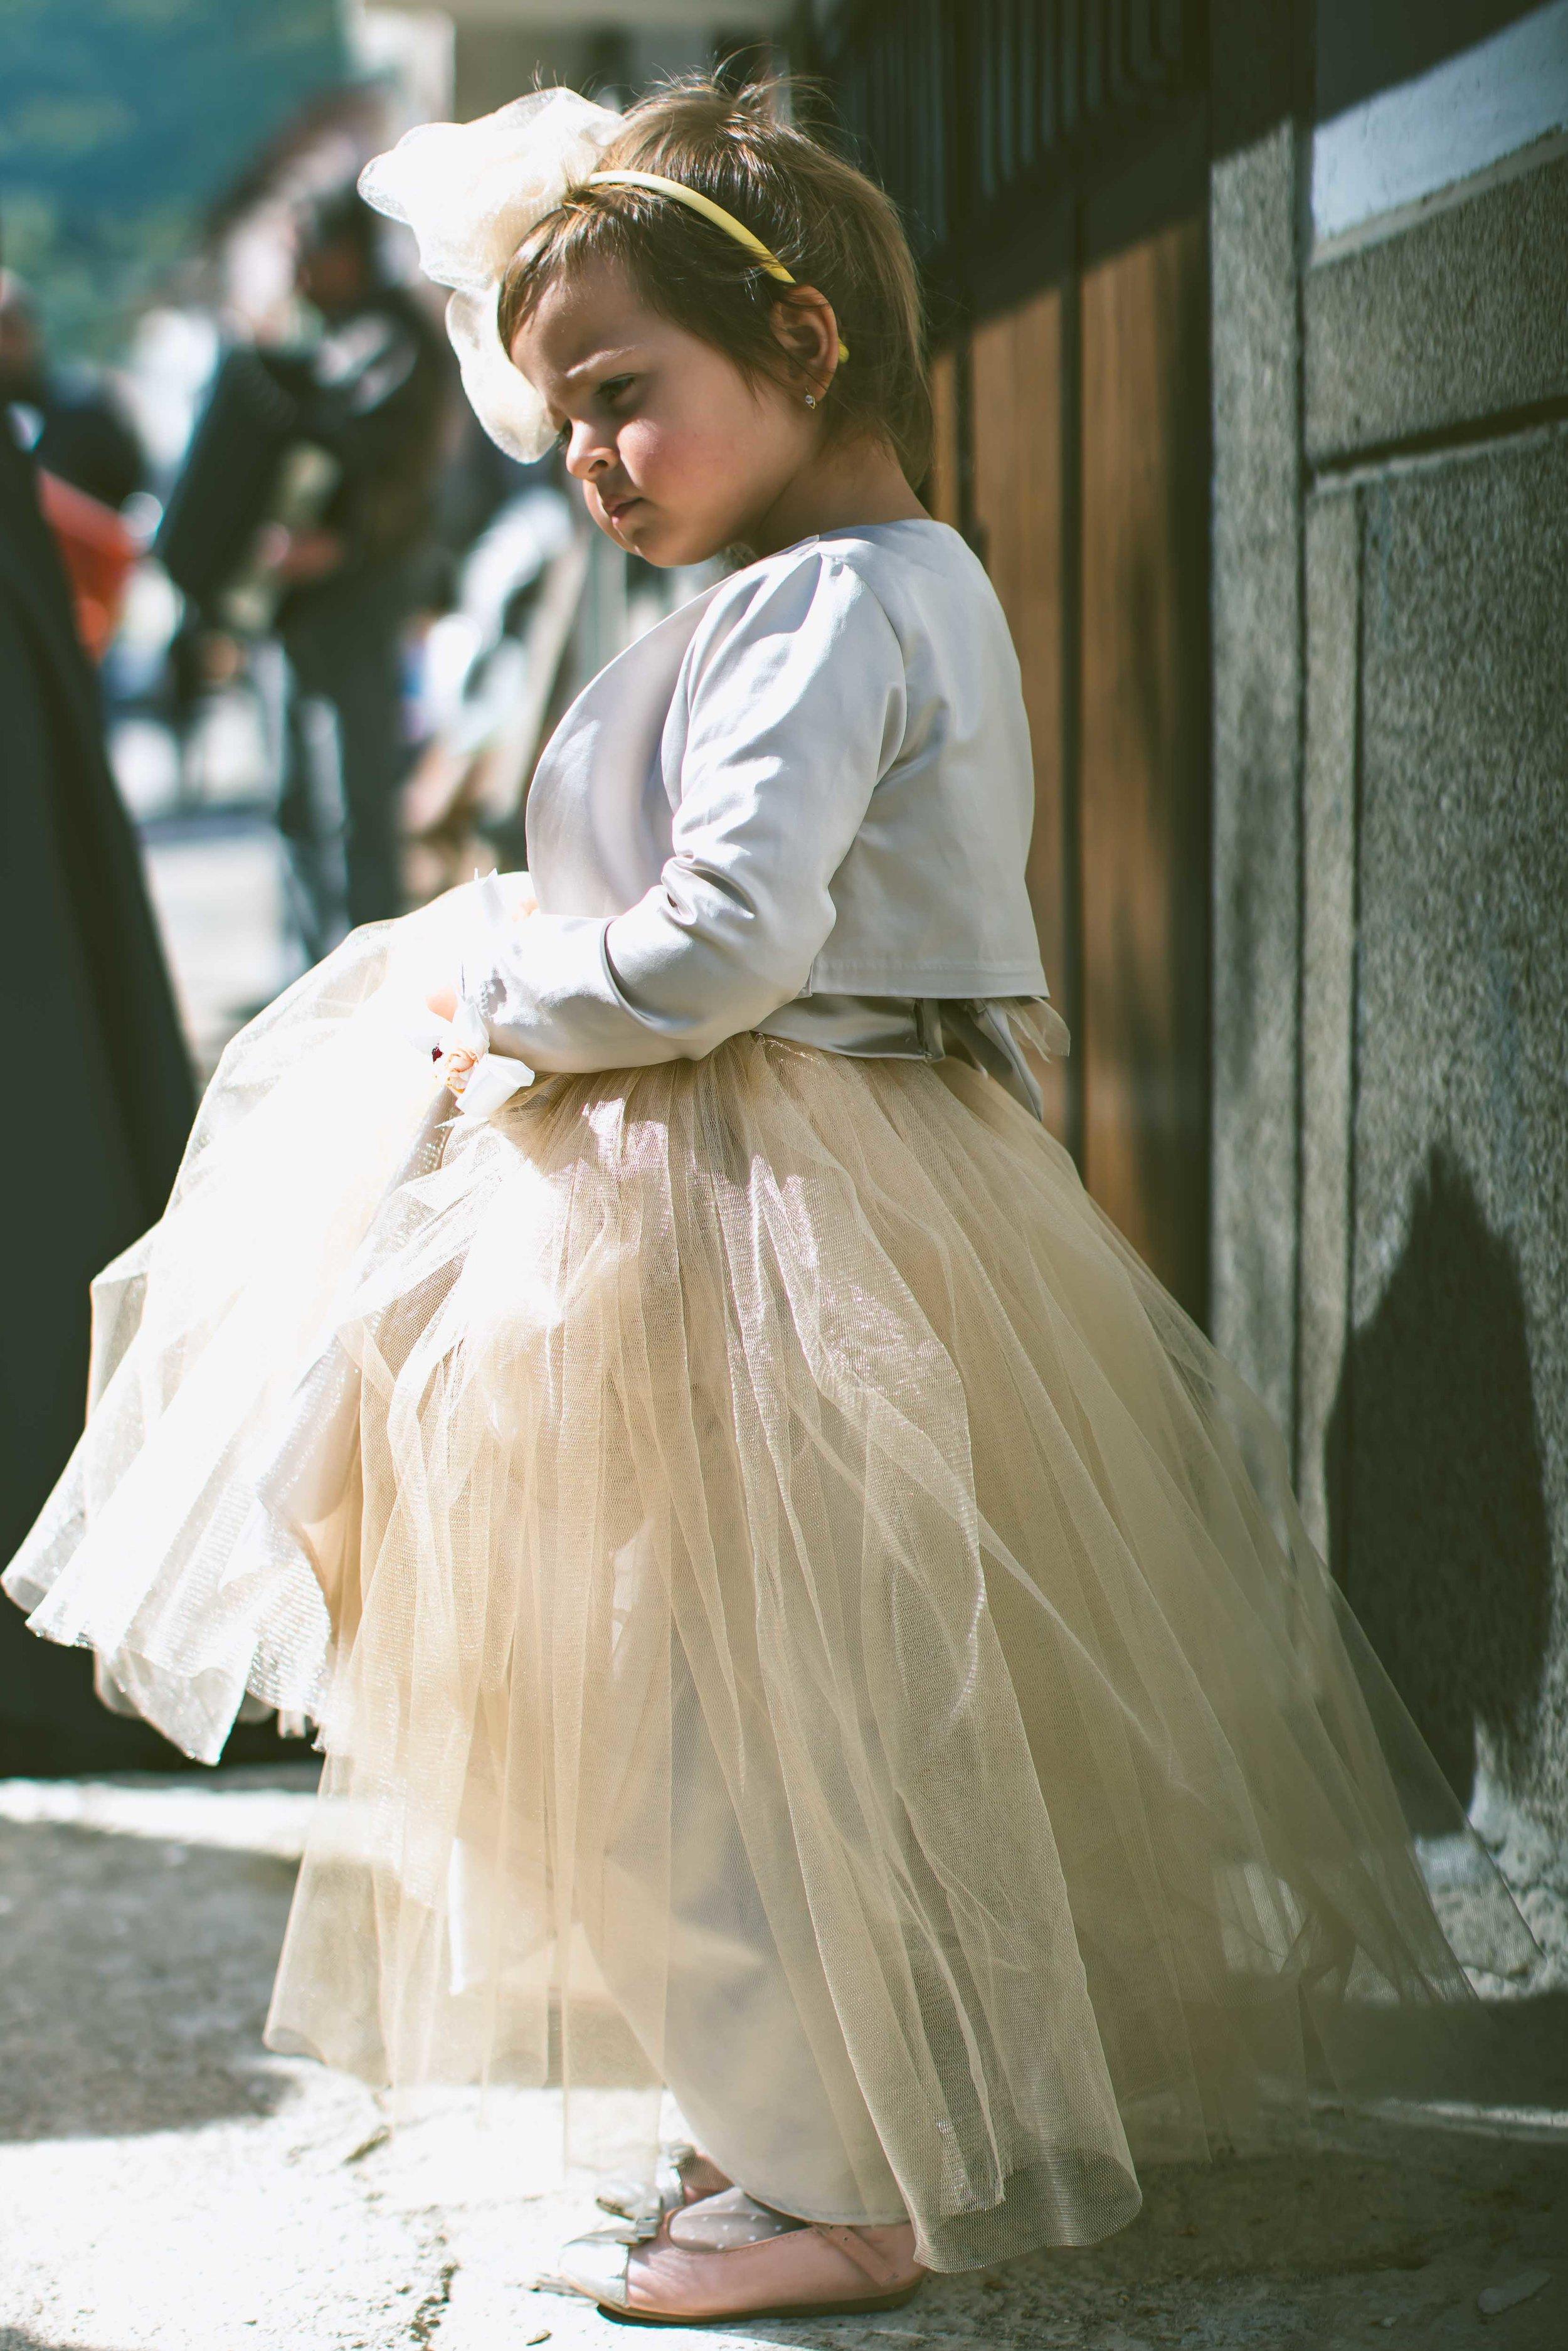 You get to show your fashion sense 🎀